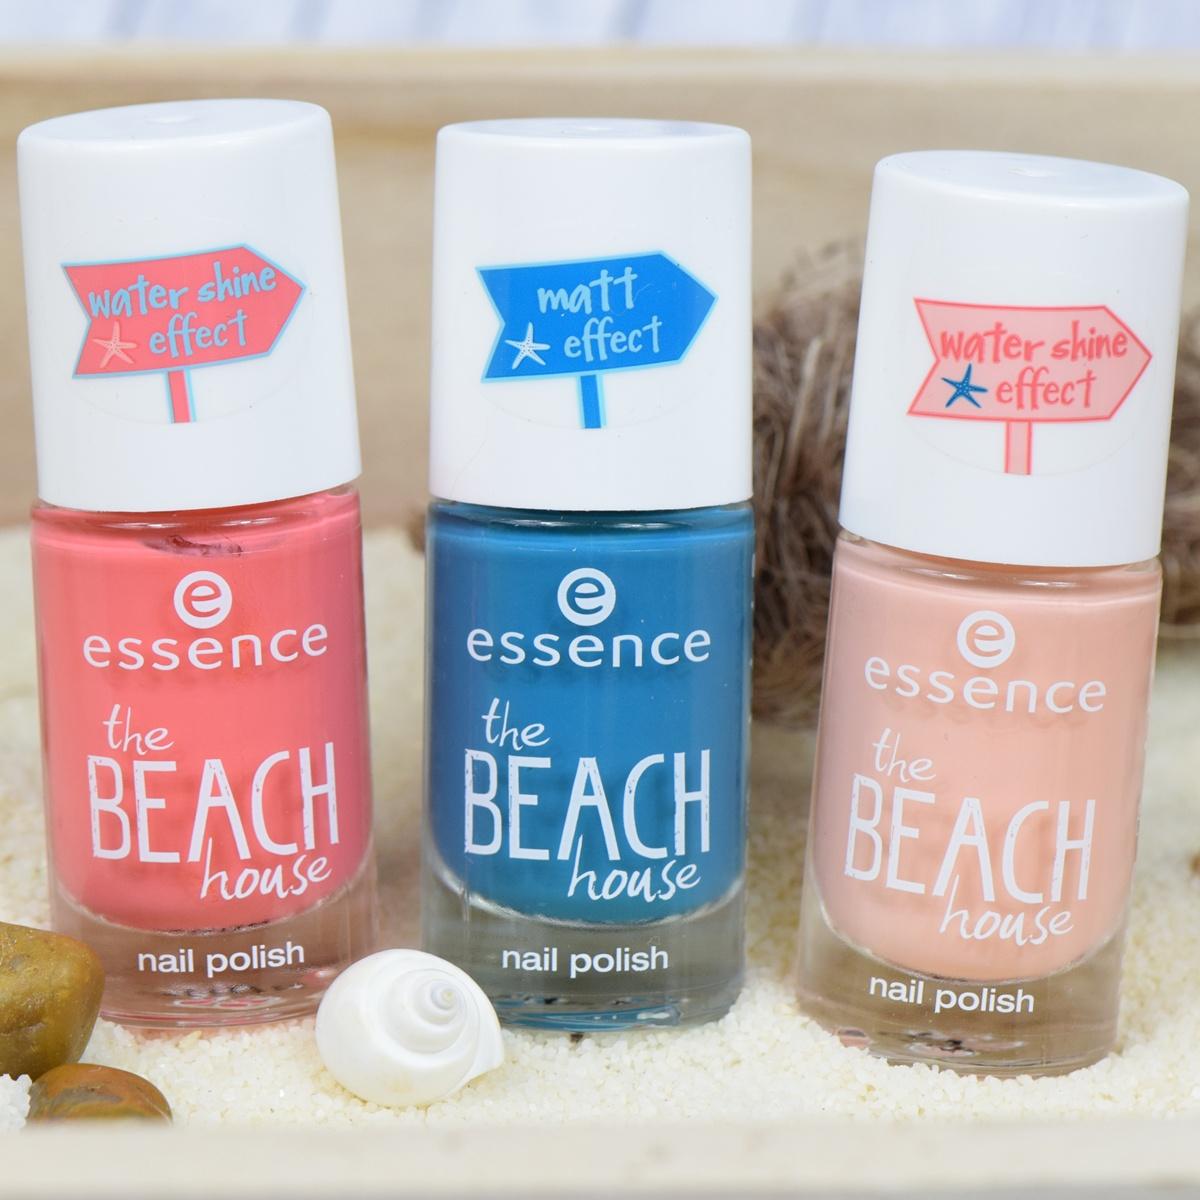 essence the beach house nail polishes